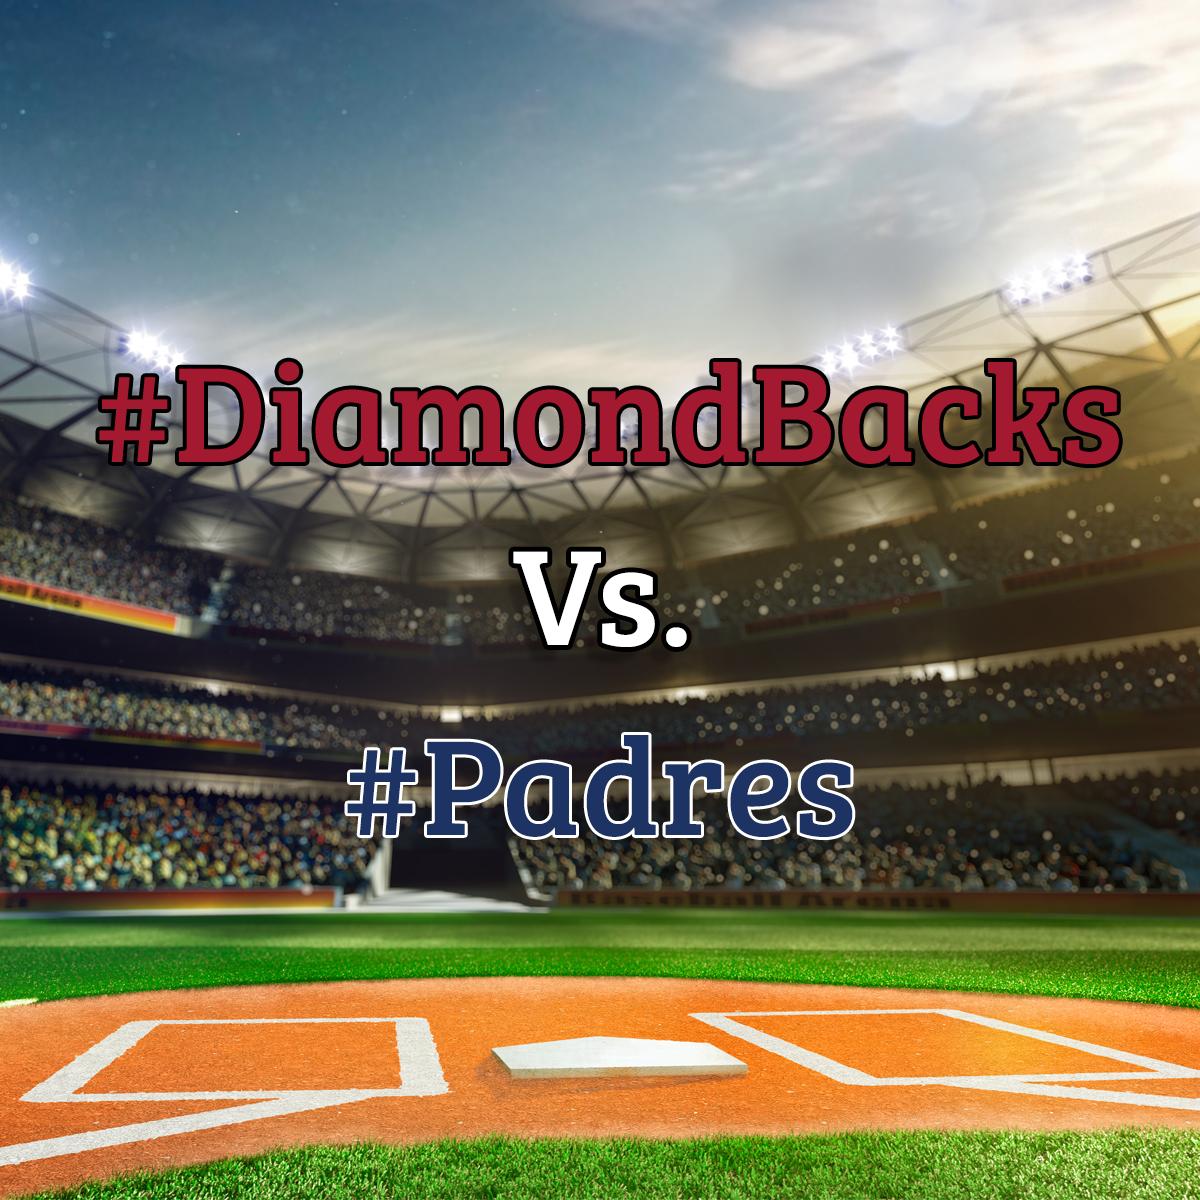 Who are you cheering for? #Diamondbacks #Padres #CactusLeague #SpringTraining